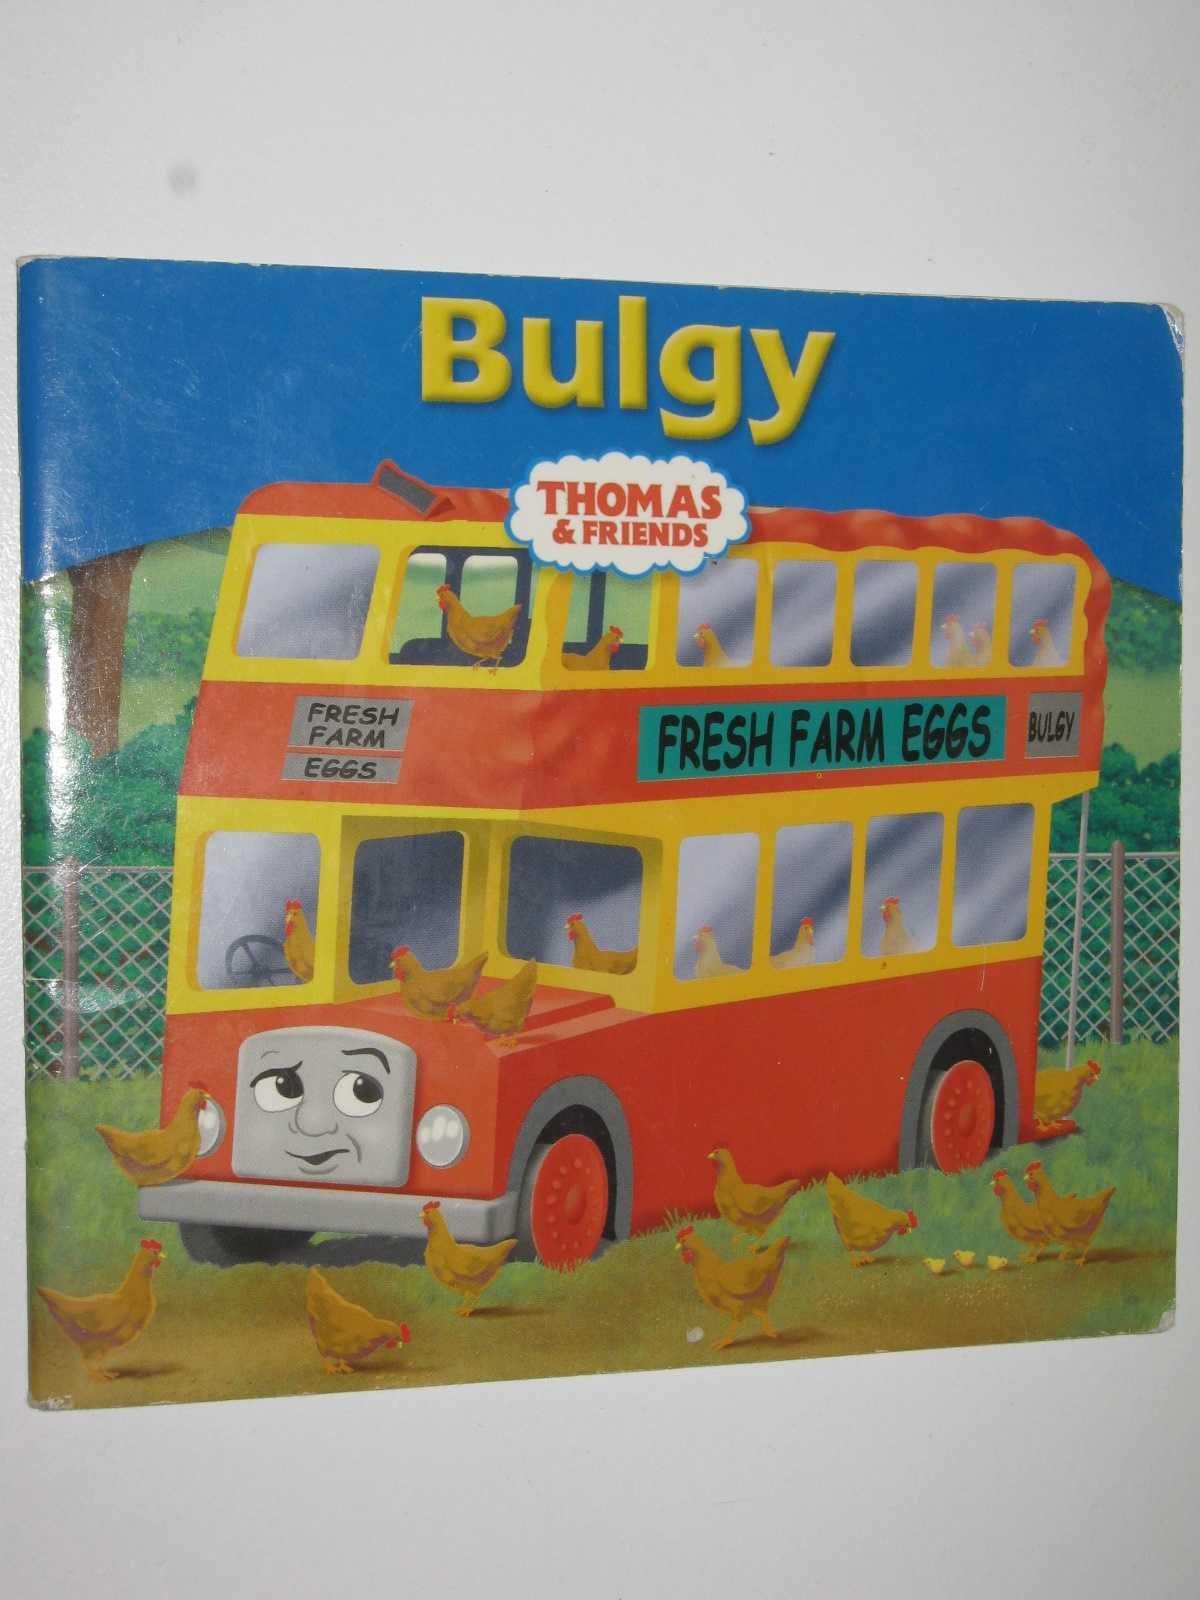 Bulgy - Thomas and Friends Series, Awdry, Rev. W.